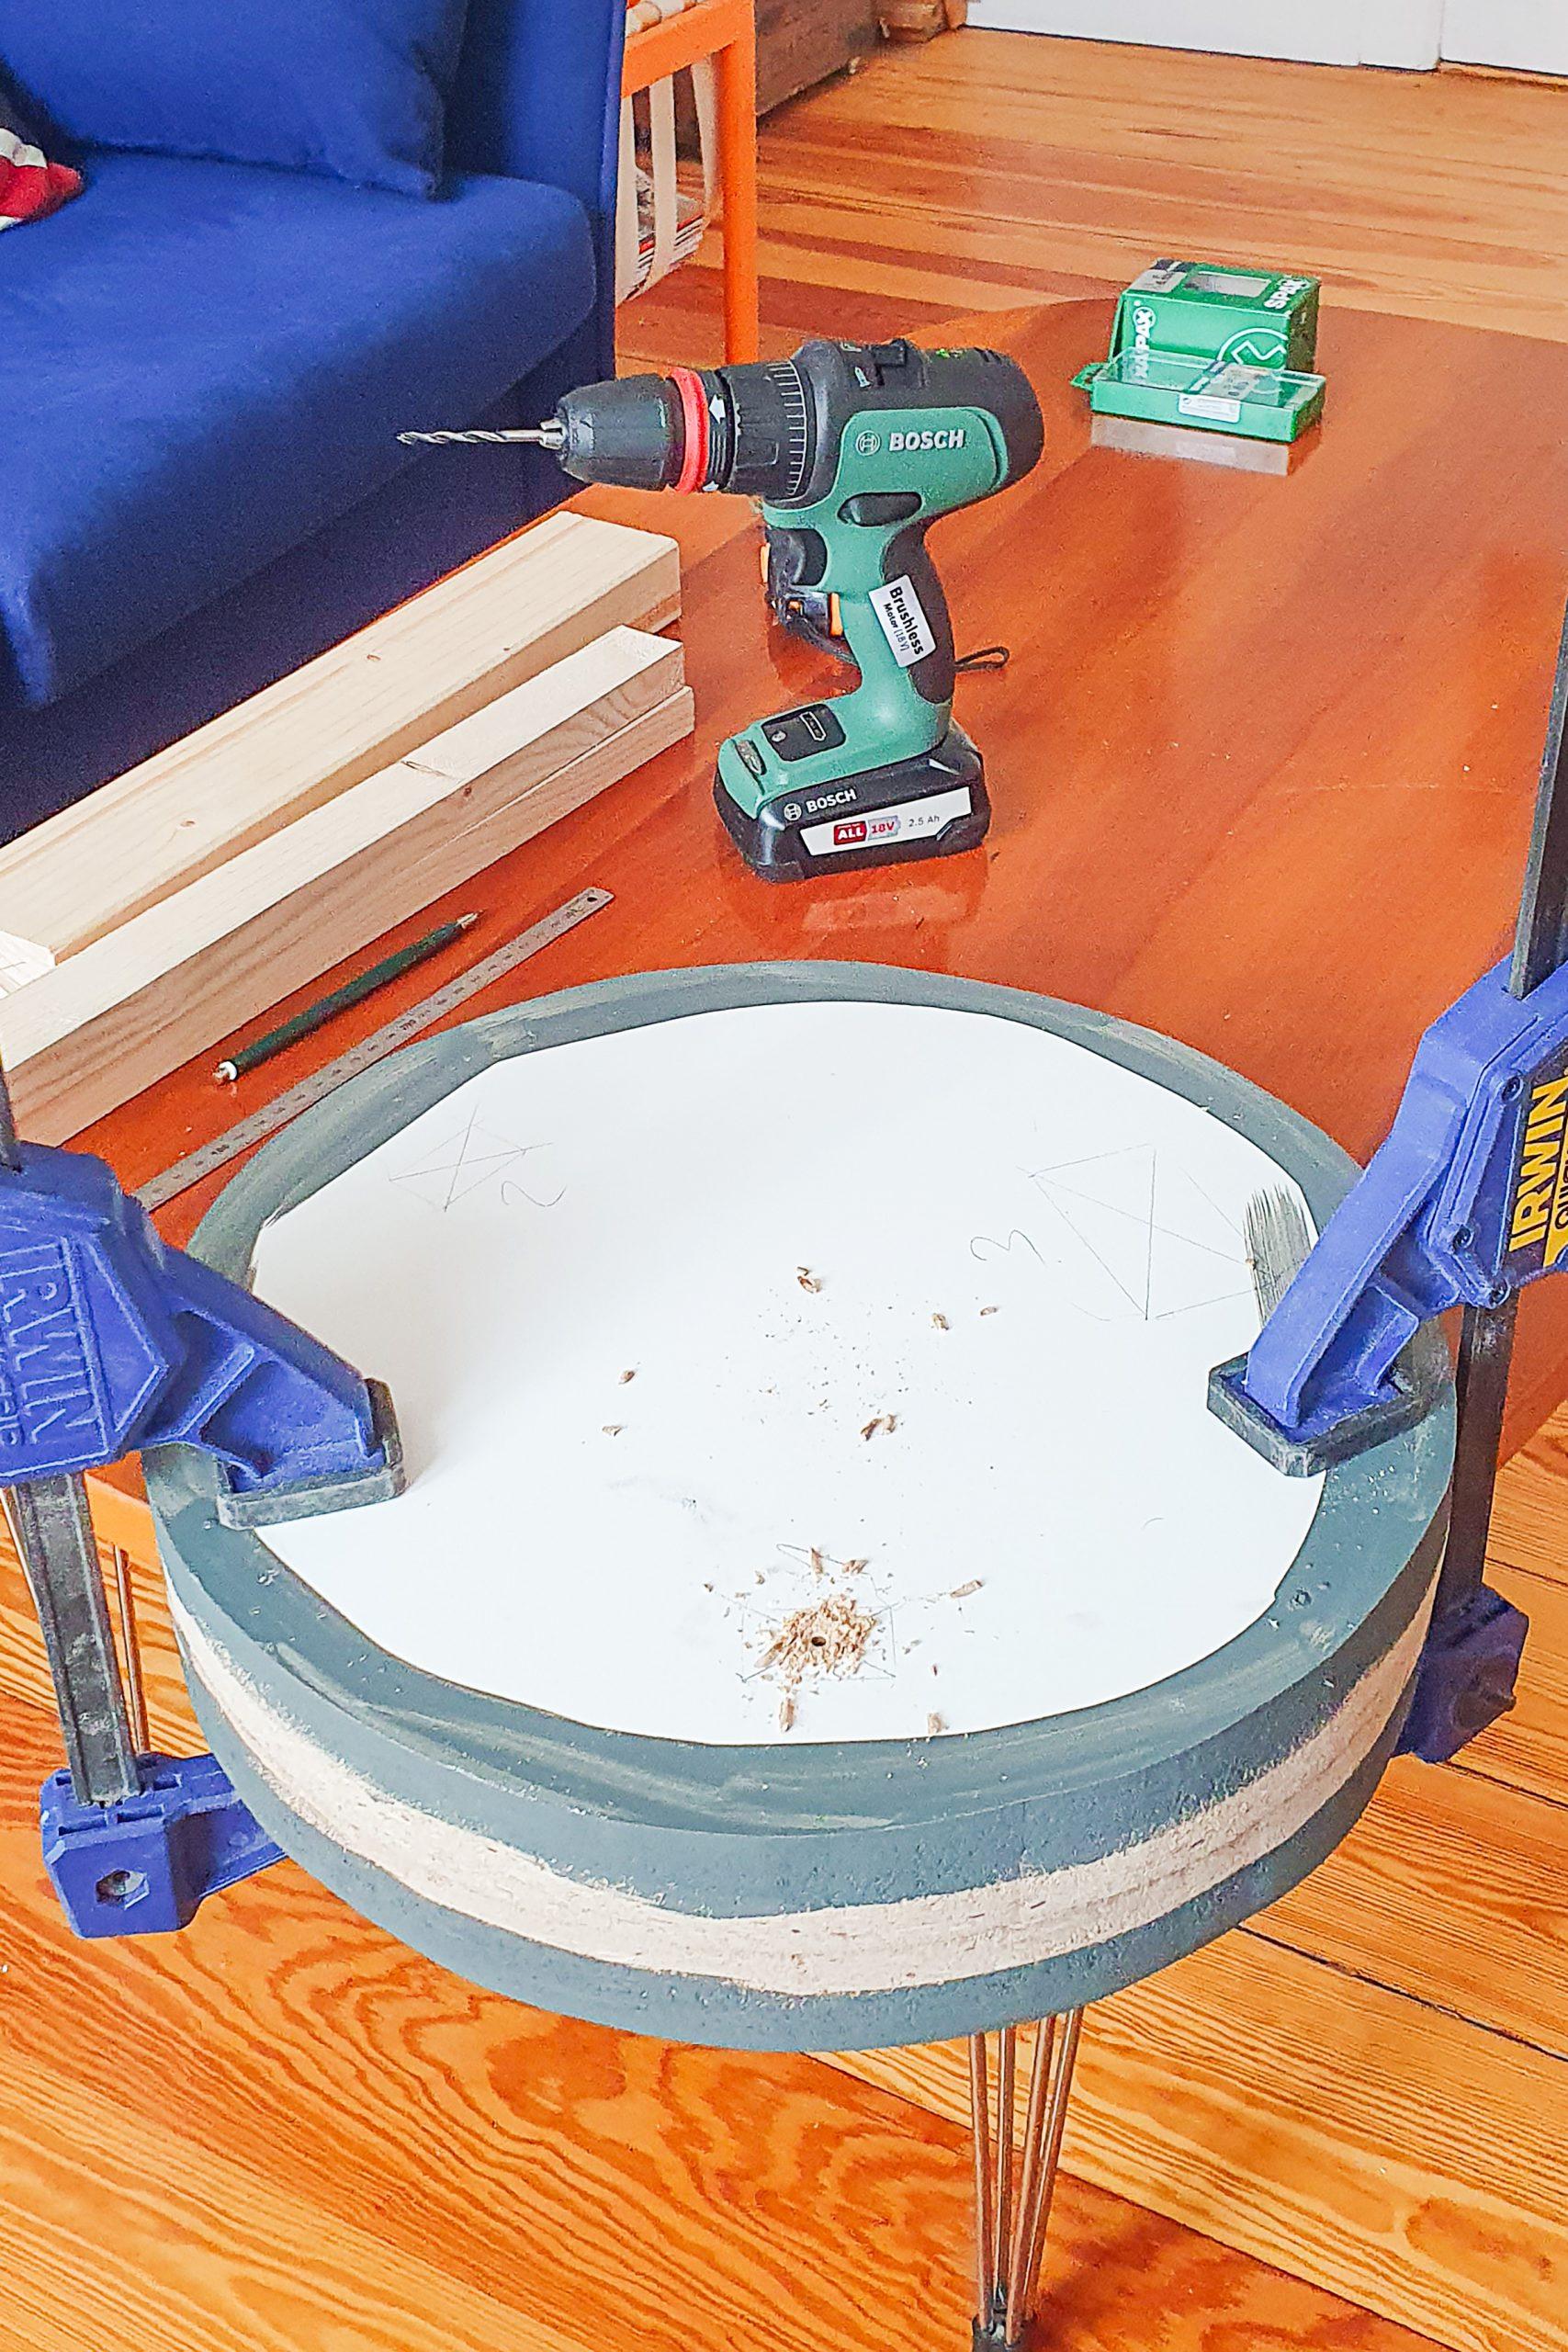 DIY Ribbed SIdetable - Attaching Circles